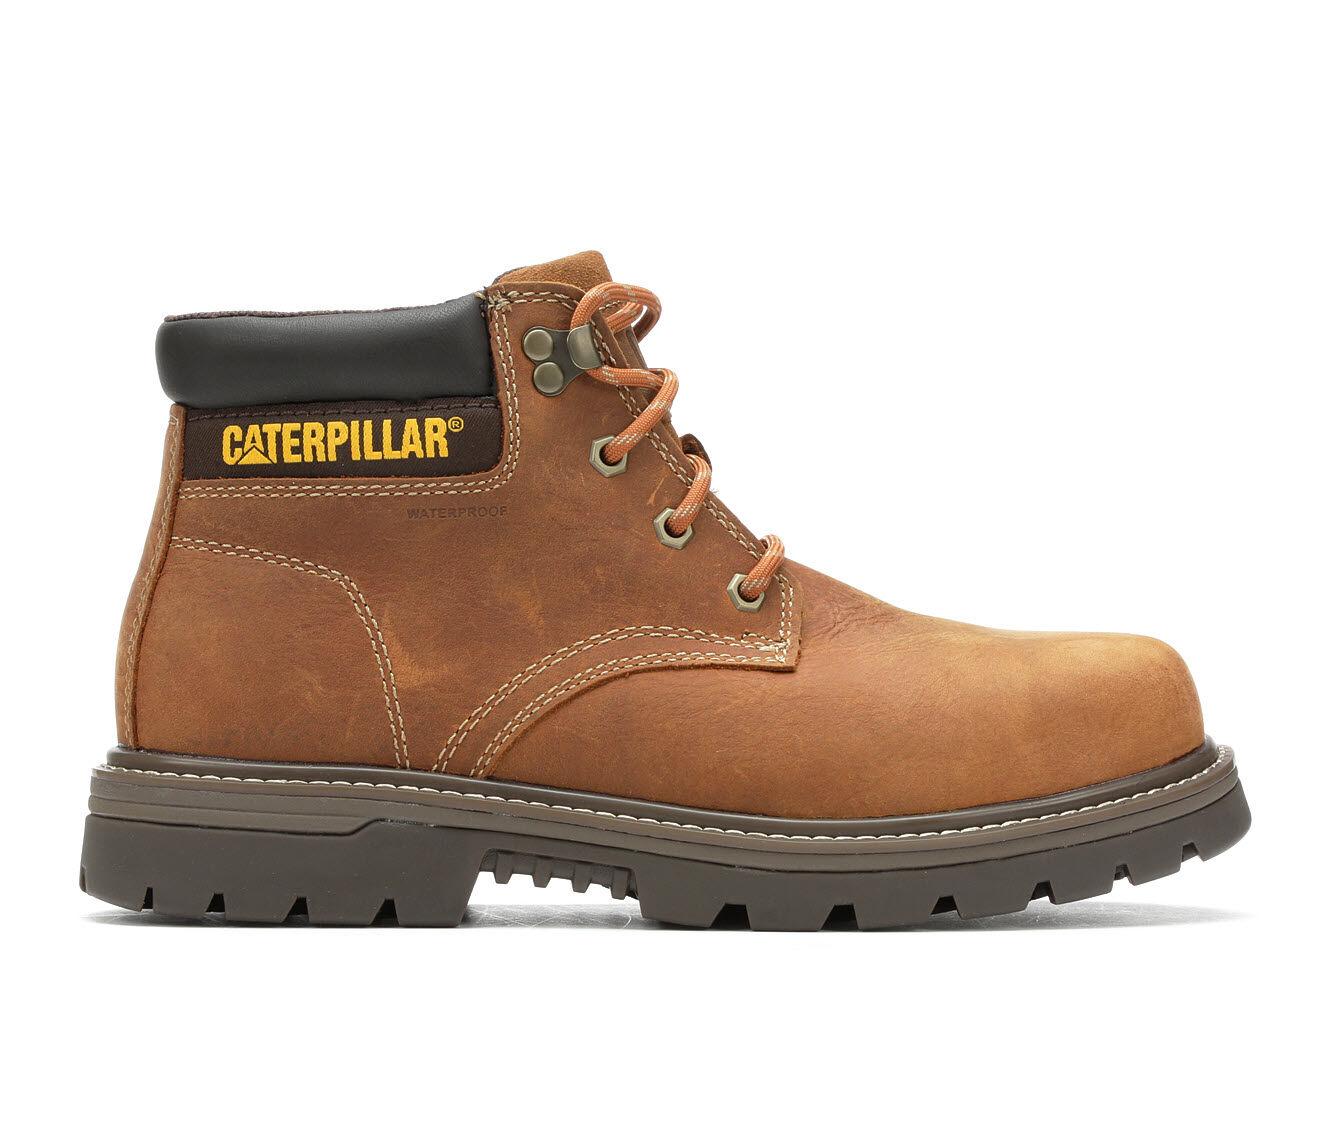 Men's Caterpillar Outbase Waterproof